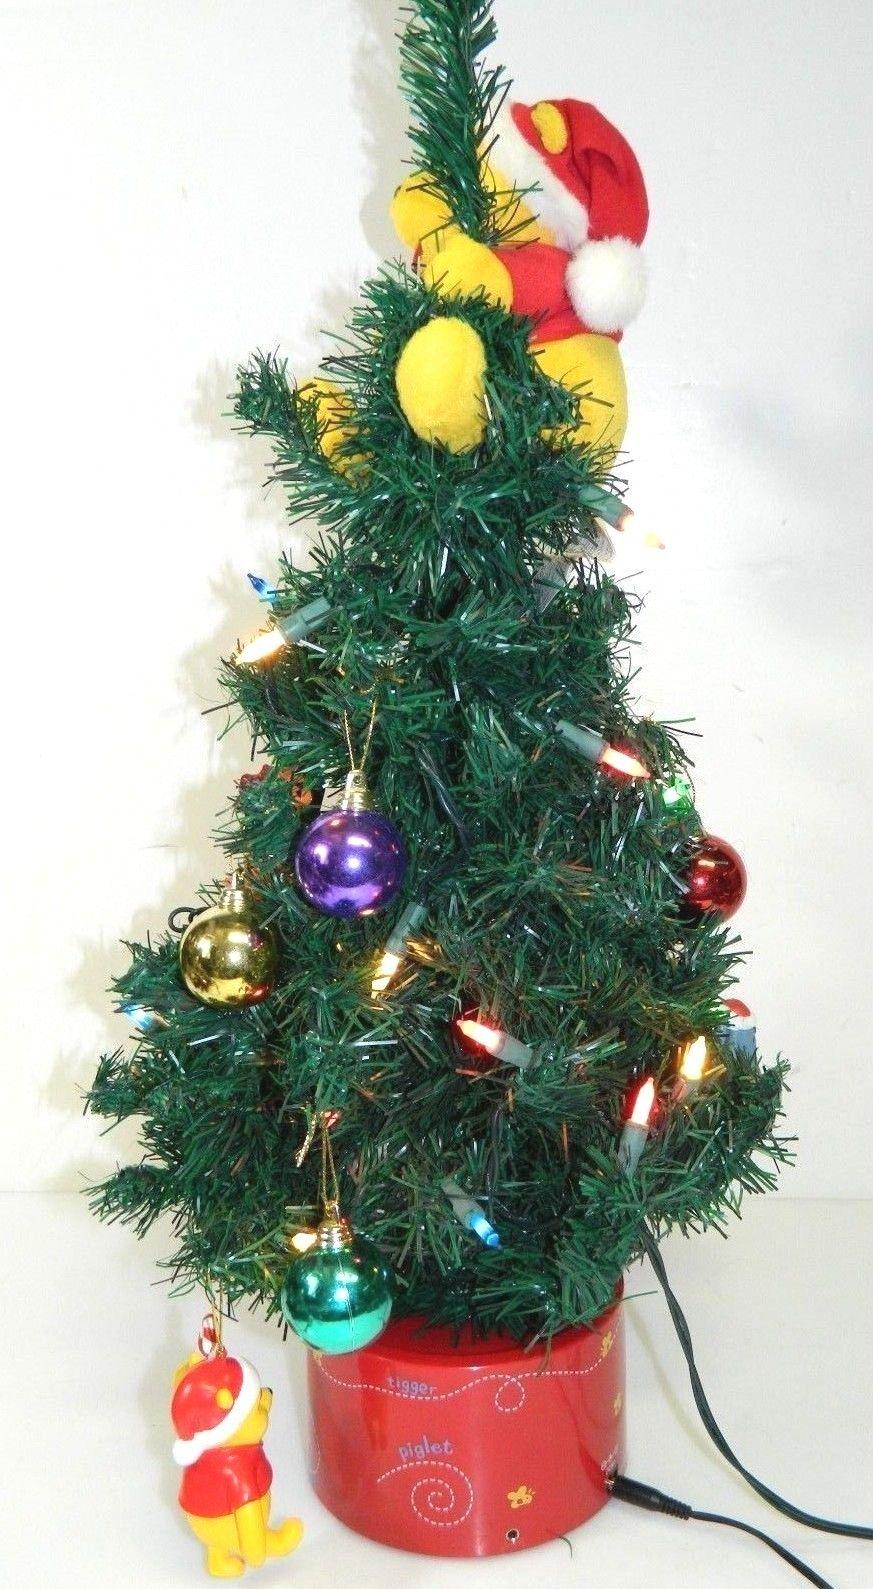 winnie the pooh animated christmas tree music lights disney tigger piglet gemmy 9jpg - Christmas Tree Wiki